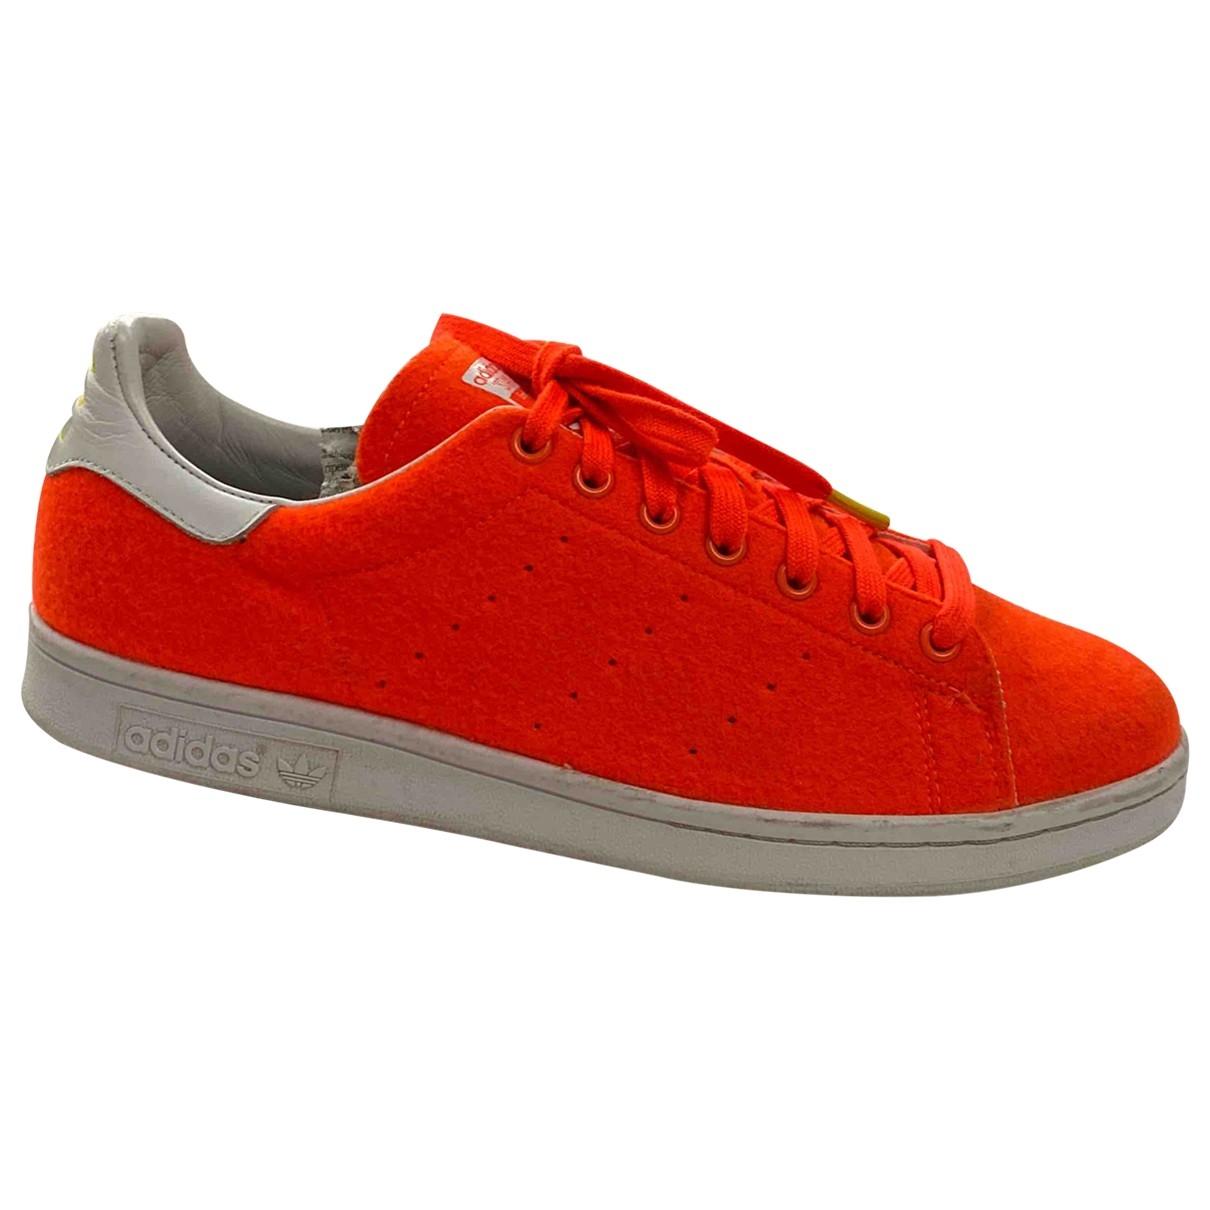 Adidas X Pharrell Williams \N Sneakers in Leder